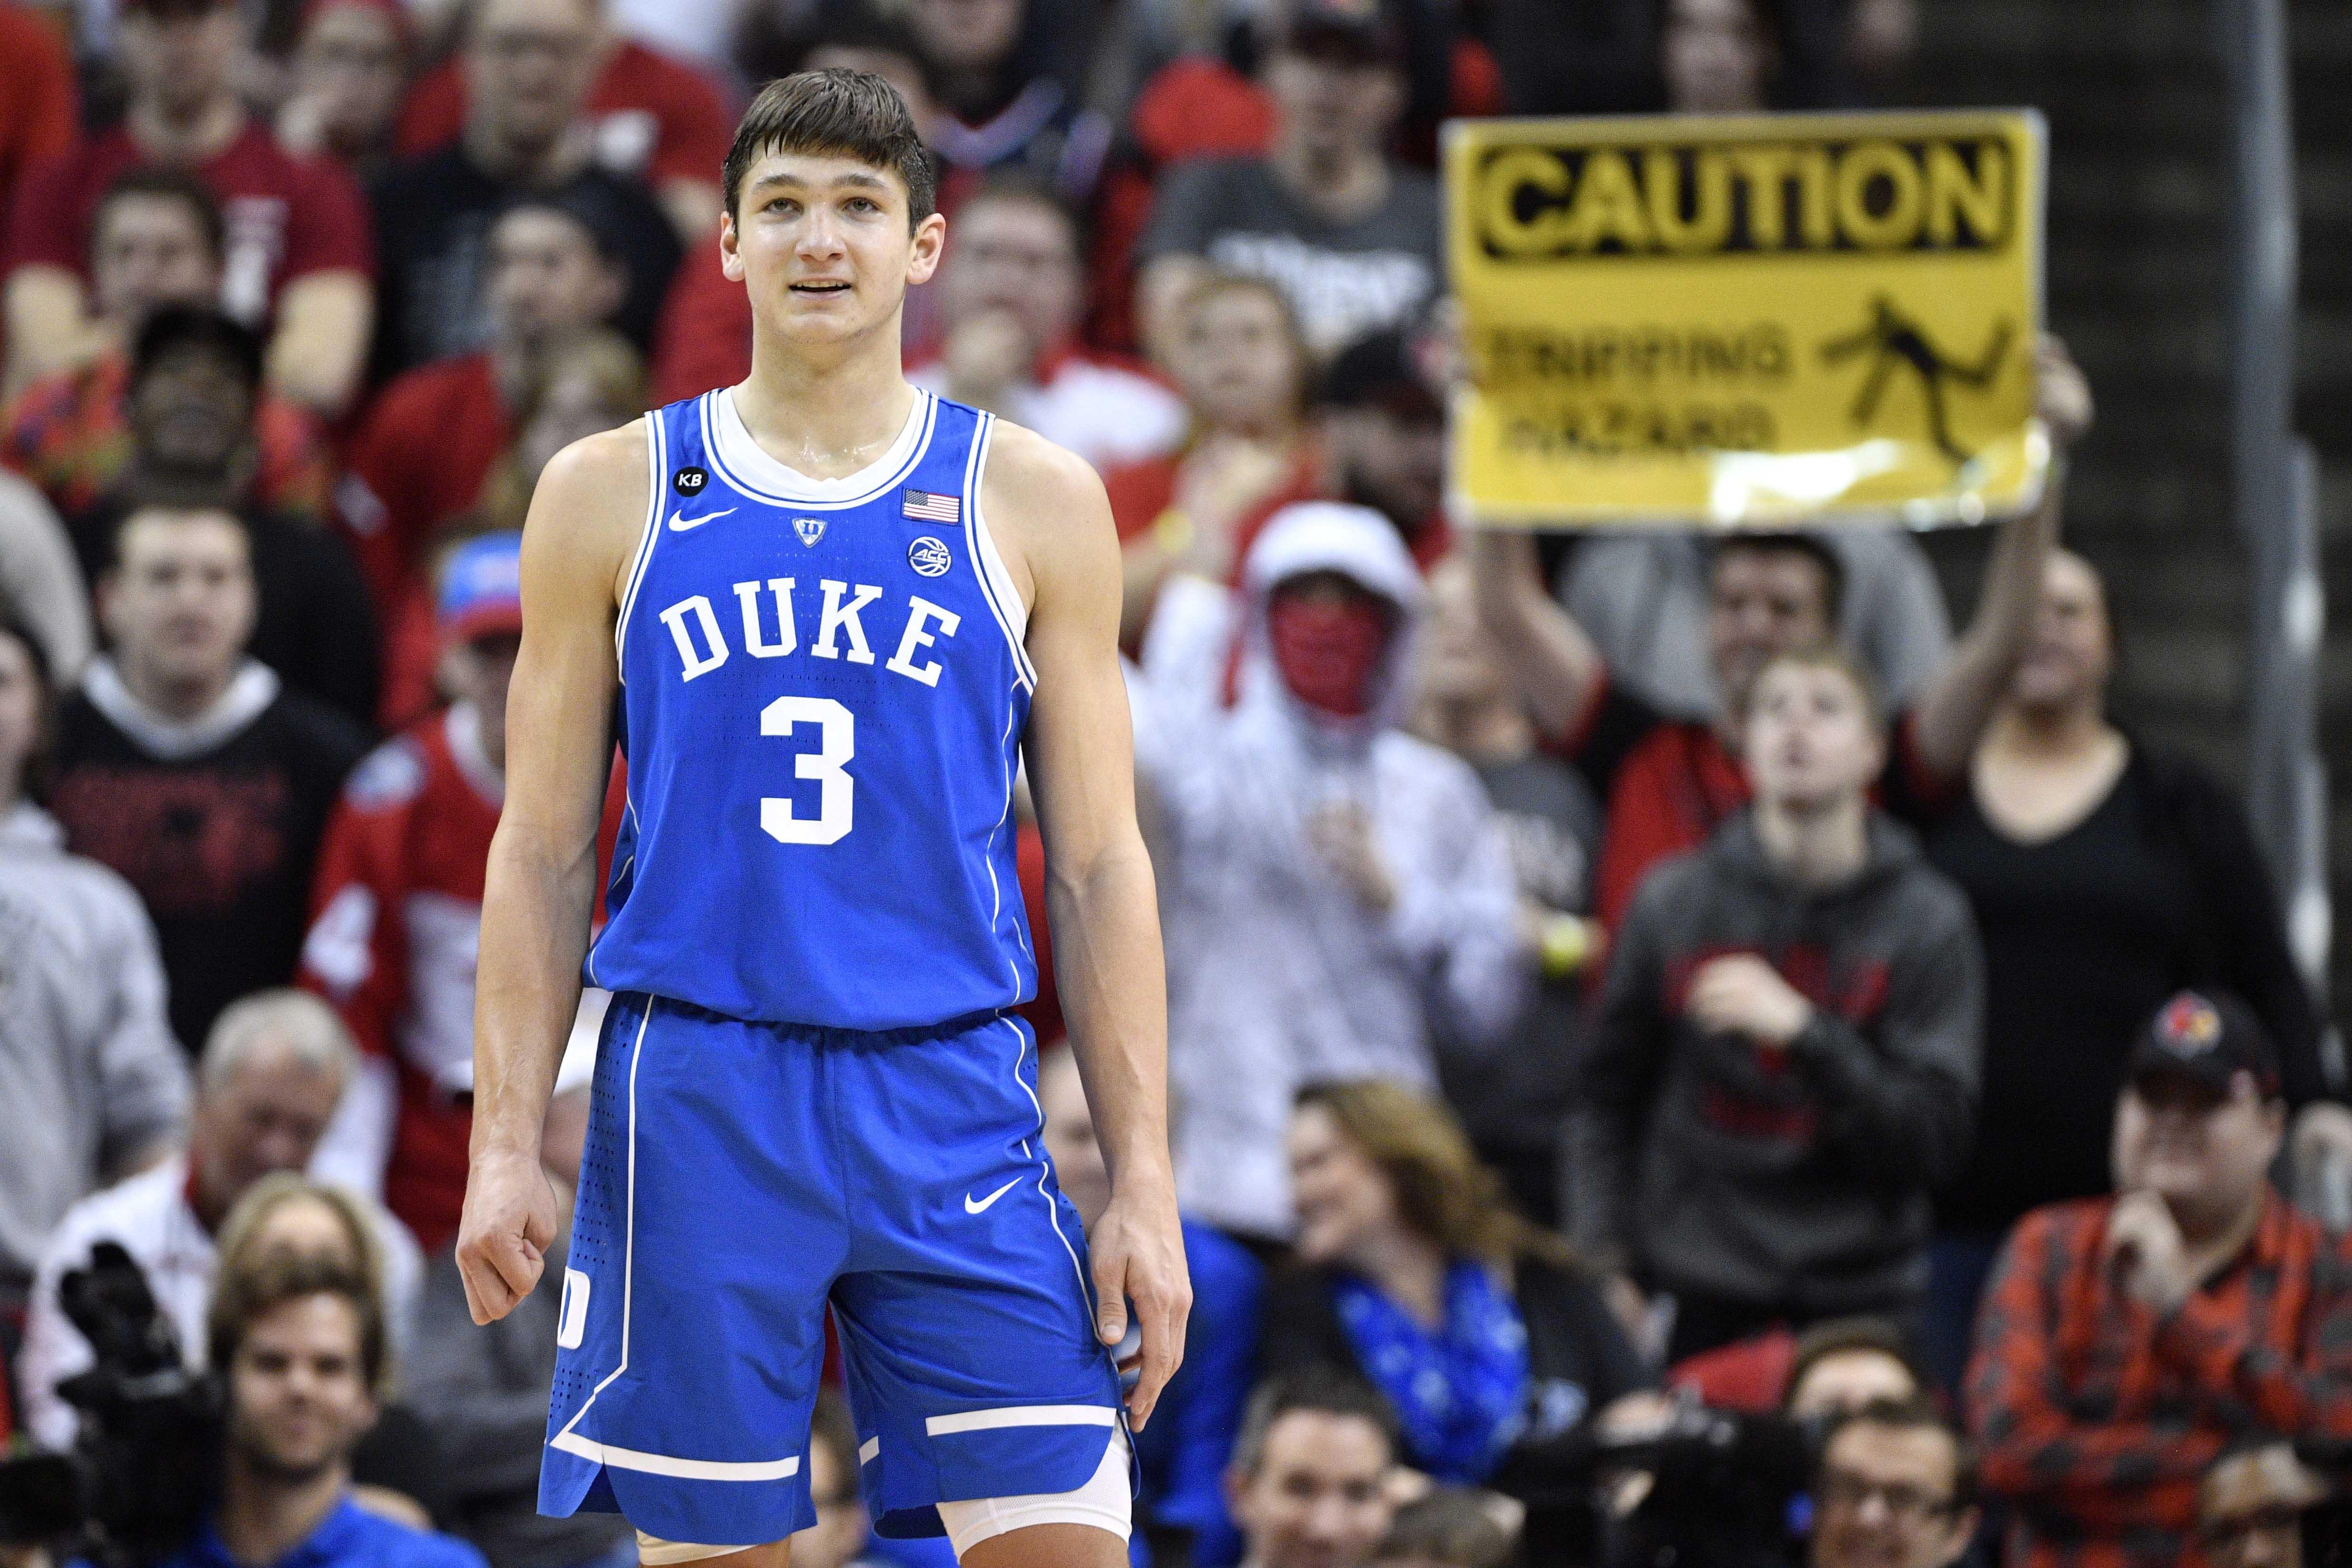 Duke basketball is in an identity crisis - SBNation.com